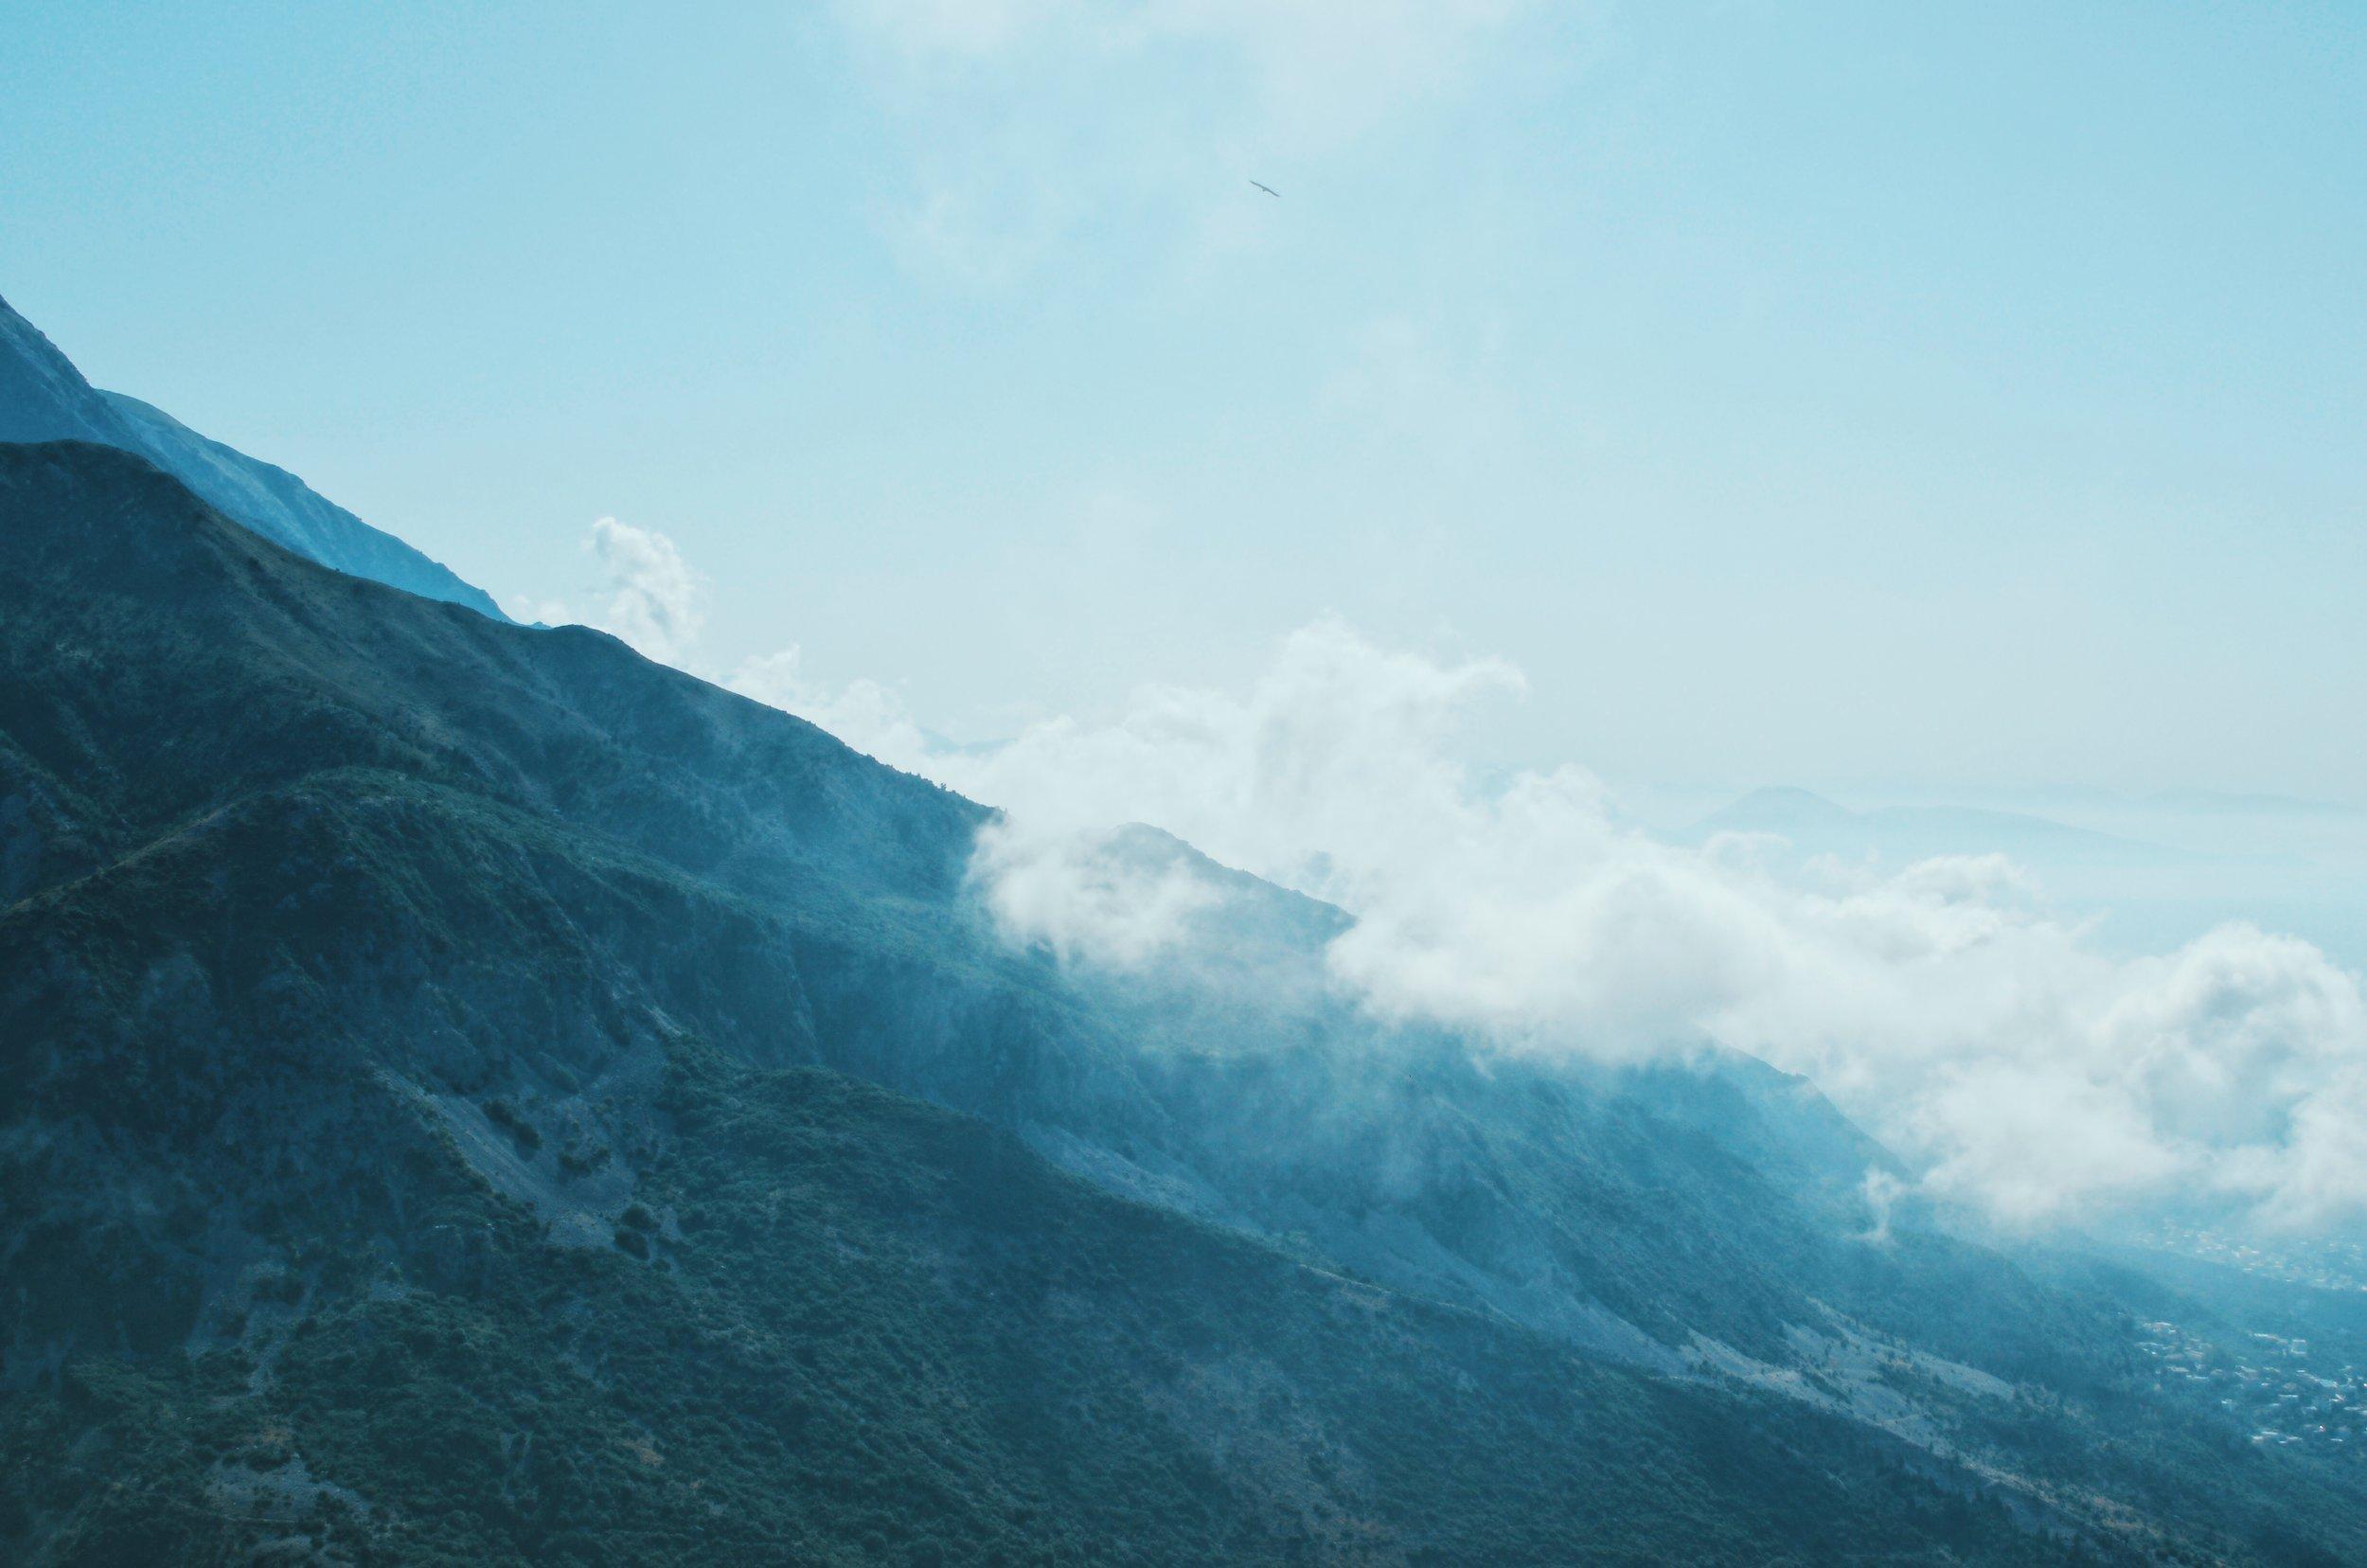 Mountains at the Llogara Pass, Albania